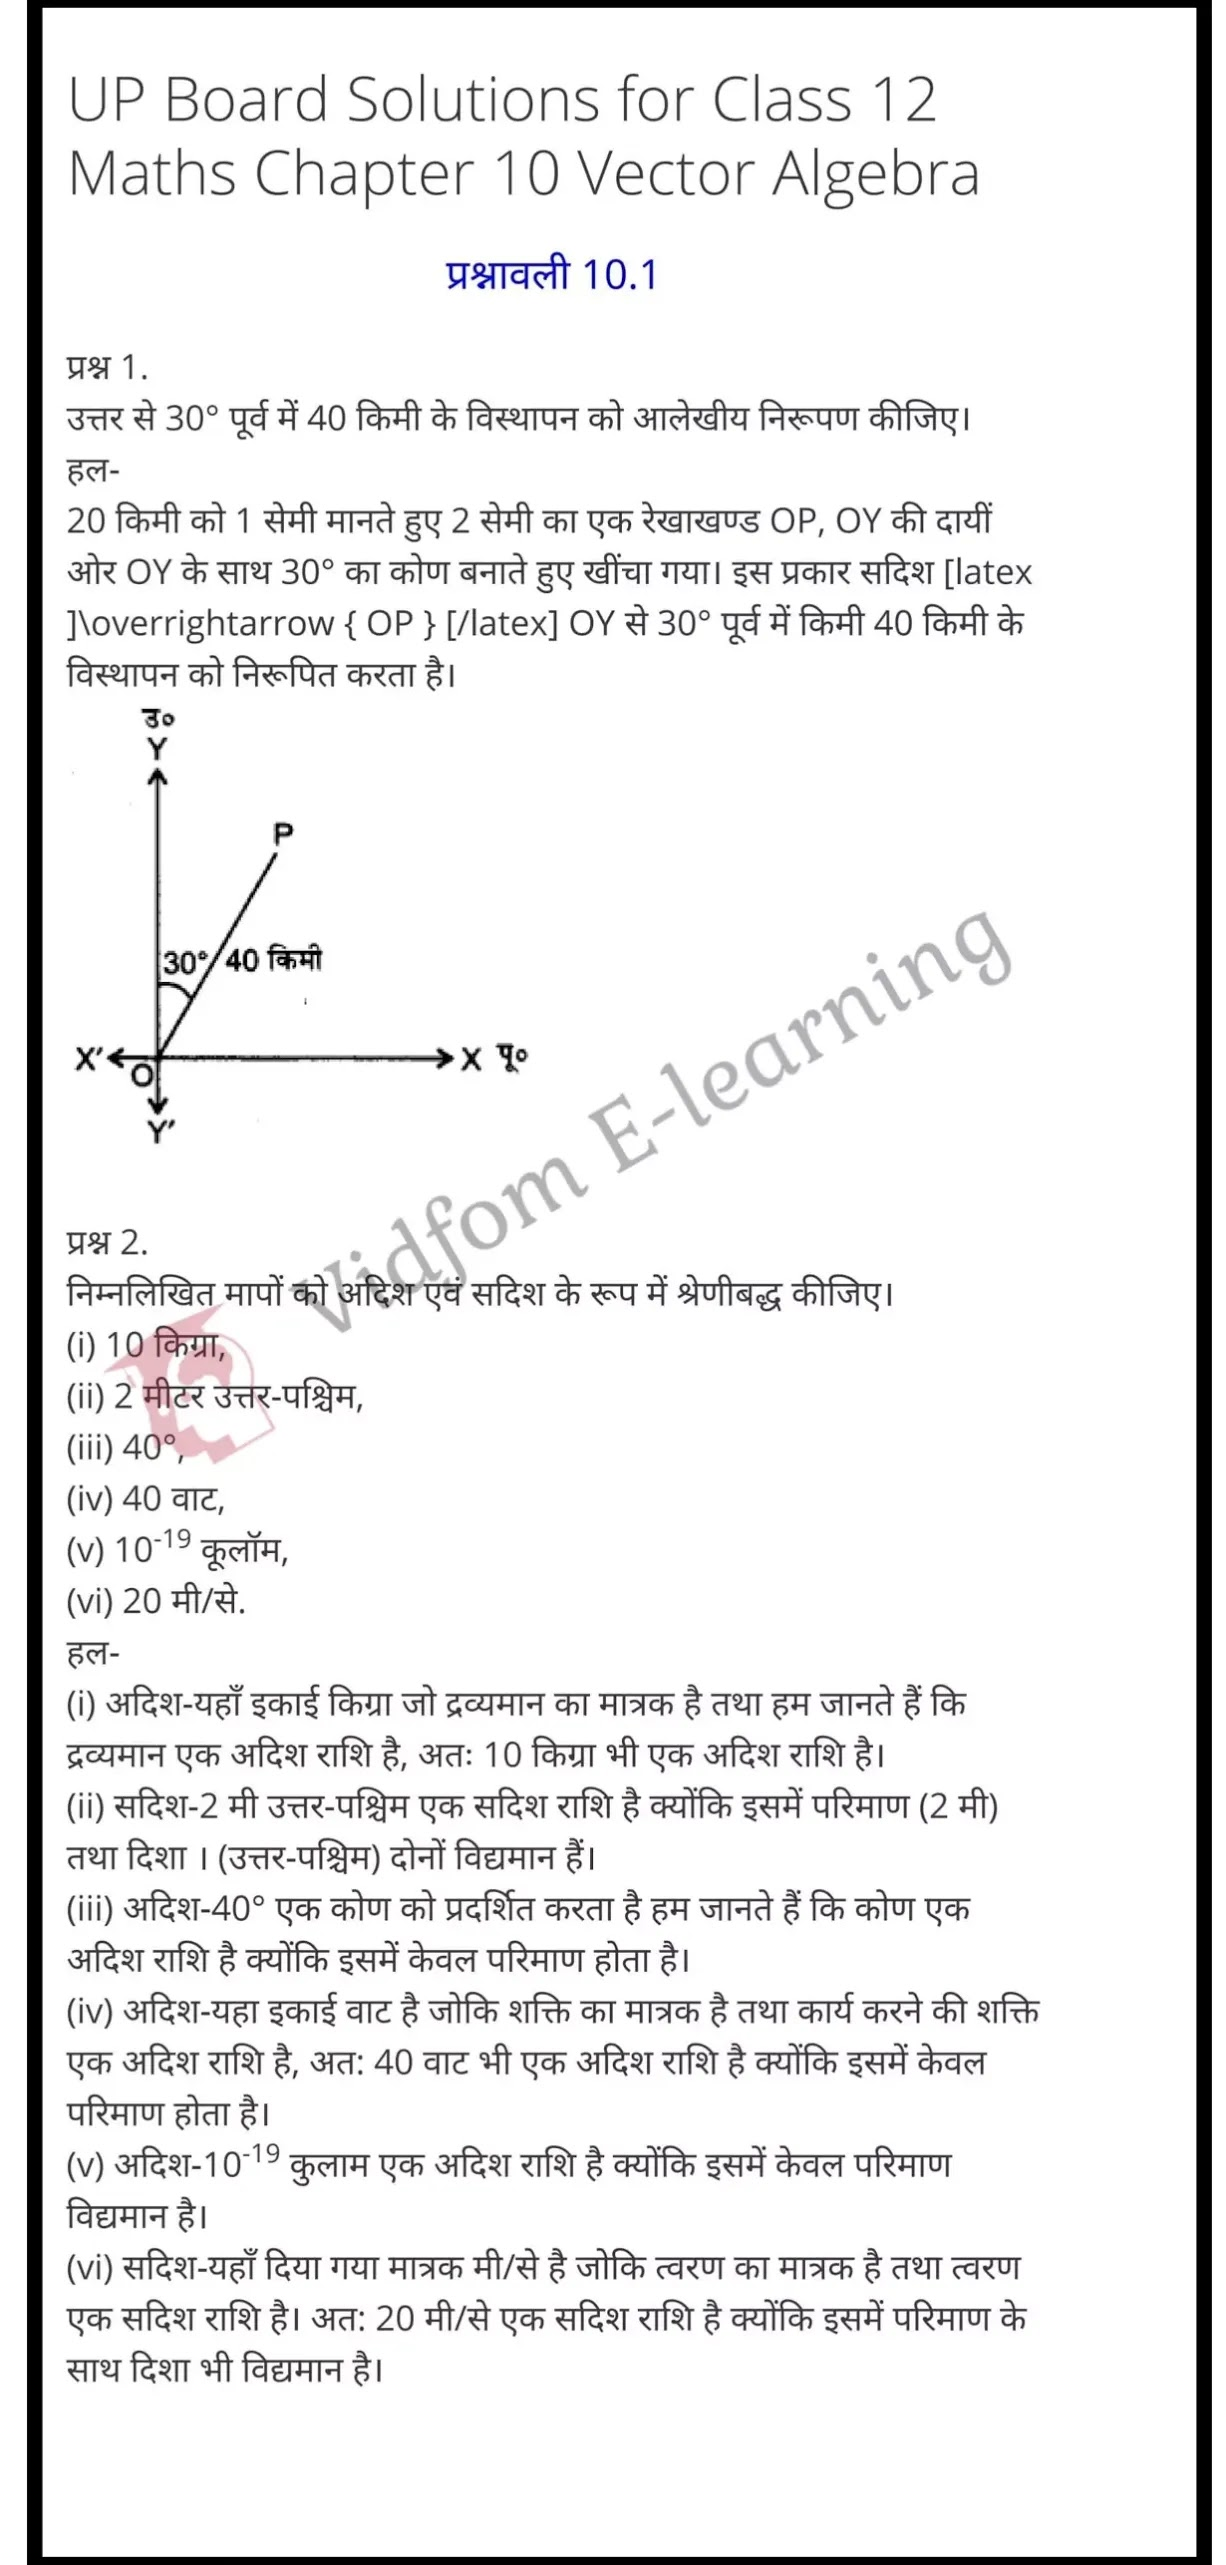 कक्षा 12 गणित  के नोट्स  हिंदी में एनसीईआरटी समाधान,     class 12 Maths Chapter 10,   class 12 Maths Chapter 10 ncert solutions in Hindi,   class 12 Maths Chapter 10 notes in hindi,   class 12 Maths Chapter 10 question answer,   class 12 Maths Chapter 10 notes,   class 12 Maths Chapter 10 class 12 Maths Chapter 10 in  hindi,    class 12 Maths Chapter 10 important questions in  hindi,   class 12 Maths Chapter 10 notes in hindi,    class 12 Maths Chapter 10 test,   class 12 Maths Chapter 10 pdf,   class 12 Maths Chapter 10 notes pdf,   class 12 Maths Chapter 10 exercise solutions,   class 12 Maths Chapter 10 notes study rankers,   class 12 Maths Chapter 10 notes,    class 12 Maths Chapter 10  class 12  notes pdf,   class 12 Maths Chapter 10 class 12  notes  ncert,   class 12 Maths Chapter 10 class 12 pdf,   class 12 Maths Chapter 10  book,   class 12 Maths Chapter 10 quiz class 12  ,    10  th class 12 Maths Chapter 10  book up board,   up board 10  th class 12 Maths Chapter 10 notes,  class 12 Maths,   class 12 Maths ncert solutions in Hindi,   class 12 Maths notes in hindi,   class 12 Maths question answer,   class 12 Maths notes,  class 12 Maths class 12 Maths Chapter 10 in  hindi,    class 12 Maths important questions in  hindi,   class 12 Maths notes in hindi,    class 12 Maths test,  class 12 Maths class 12 Maths Chapter 10 pdf,   class 12 Maths notes pdf,   class 12 Maths exercise solutions,   class 12 Maths,  class 12 Maths notes study rankers,   class 12 Maths notes,  class 12 Maths notes,   class 12 Maths  class 12  notes pdf,   class 12 Maths class 12  notes  ncert,   class 12 Maths class 12 pdf,   class 12 Maths  book,  class 12 Maths quiz class 12  ,  10  th class 12 Maths    book up board,    up board 10  th class 12 Maths notes,      कक्षा 12 गणित अध्याय 10 ,  कक्षा 12 गणित, कक्षा 12 गणित अध्याय 10  के नोट्स हिंदी में,  कक्षा 12 का हिंदी अध्याय 10 का प्रश्न उत्तर,  कक्षा 12 गणित अध्याय 10 के नोट्स,  10 कक्षा गणित  हिंदी में, कक्षा 12 गणित अध्याय 10  हिं